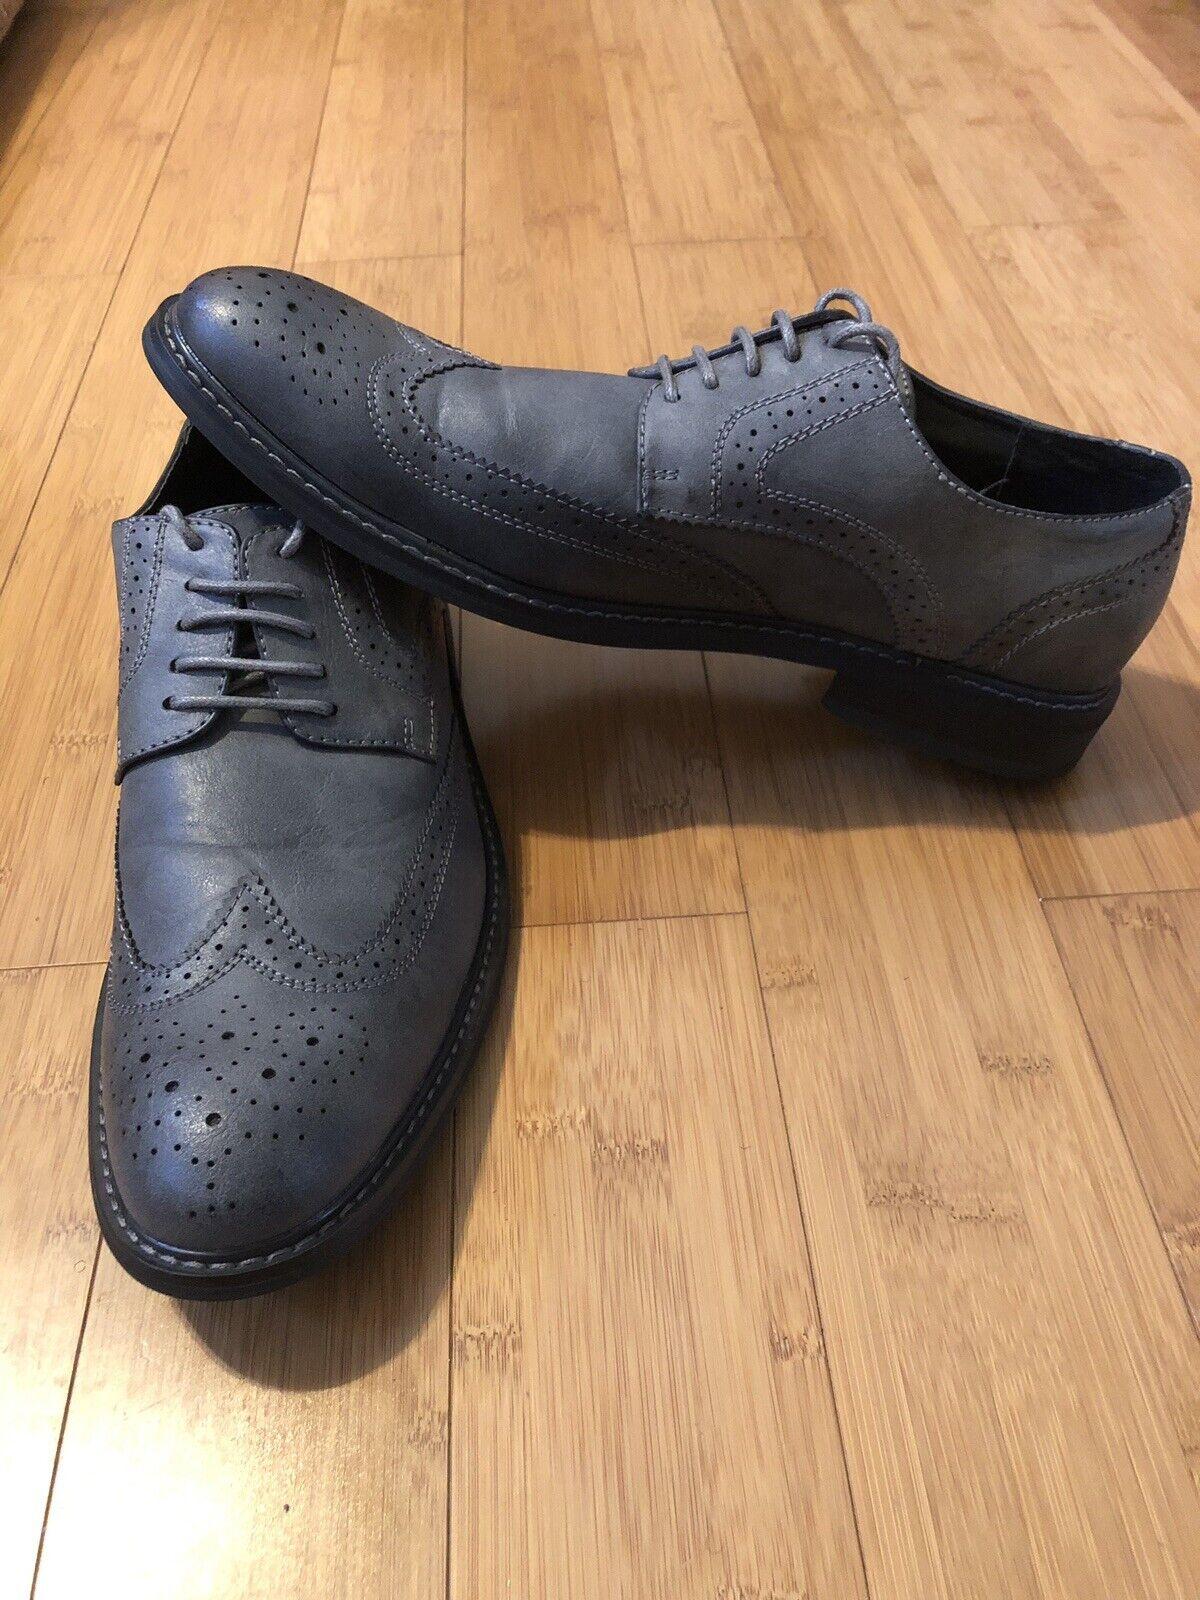 perry ellis portfolio shoes - image 4